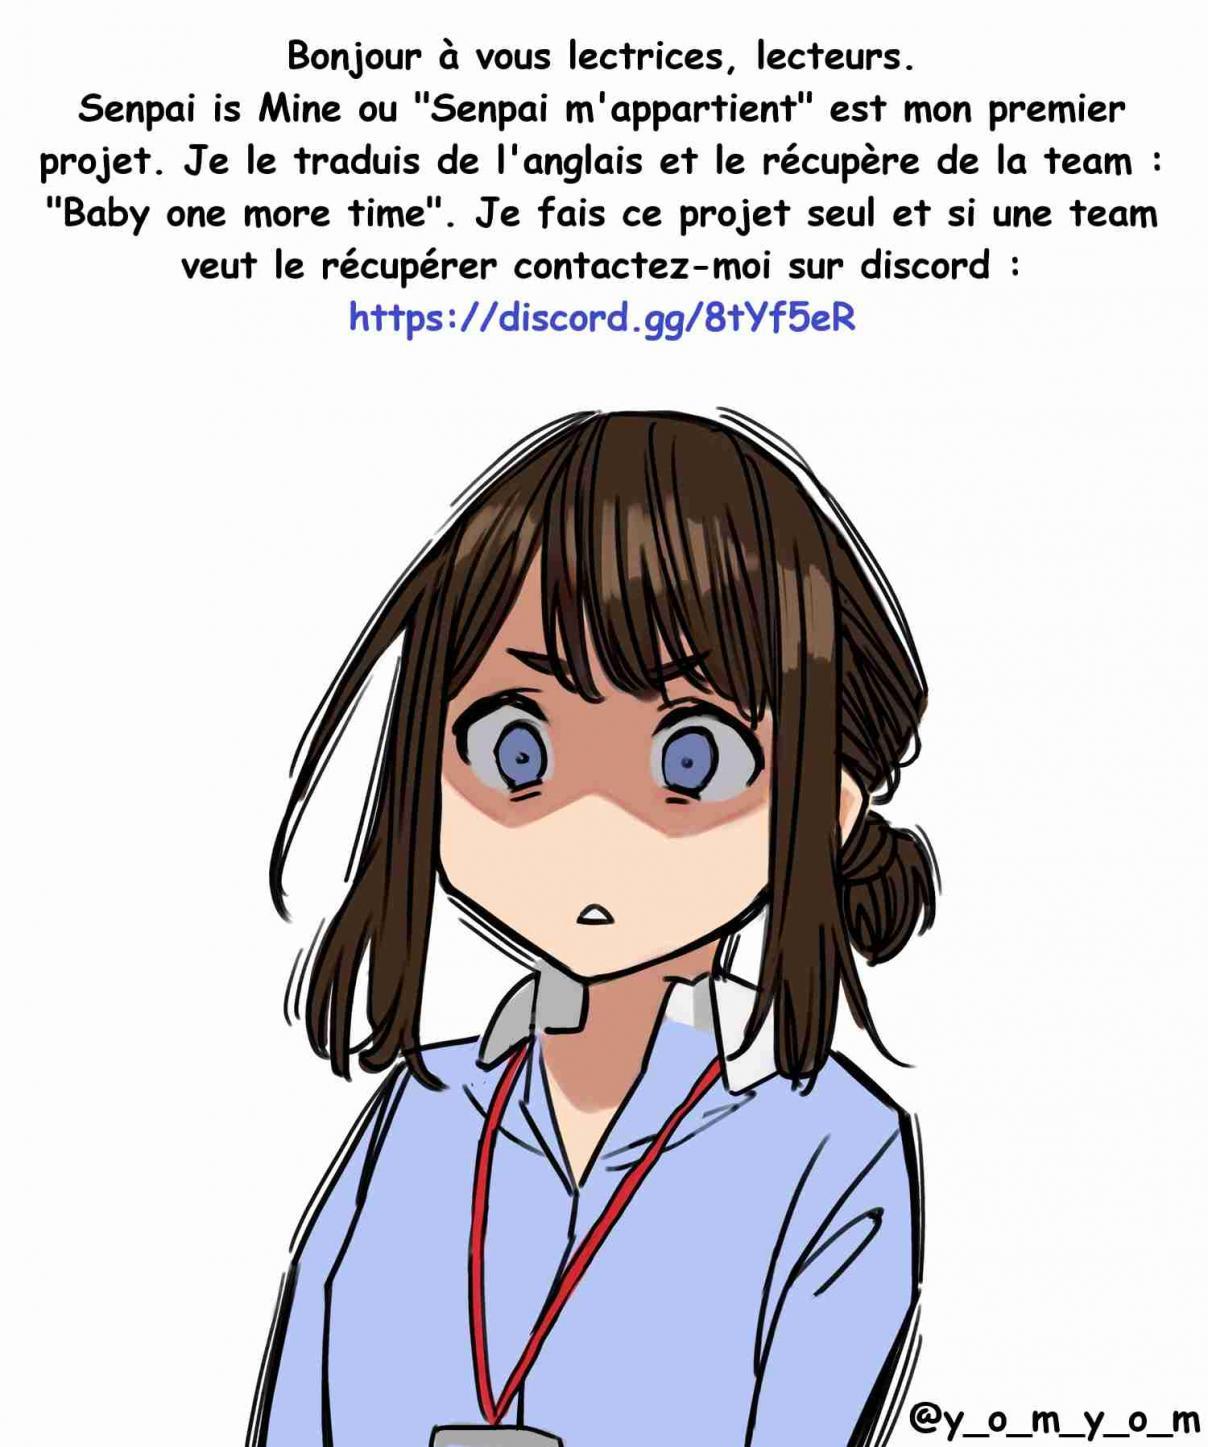 https://nine.mangadogs.com/fr_manga/pic2/21/13525/559219/fda2be844681e814bb21ade3eaf745ca.jpg Page 1